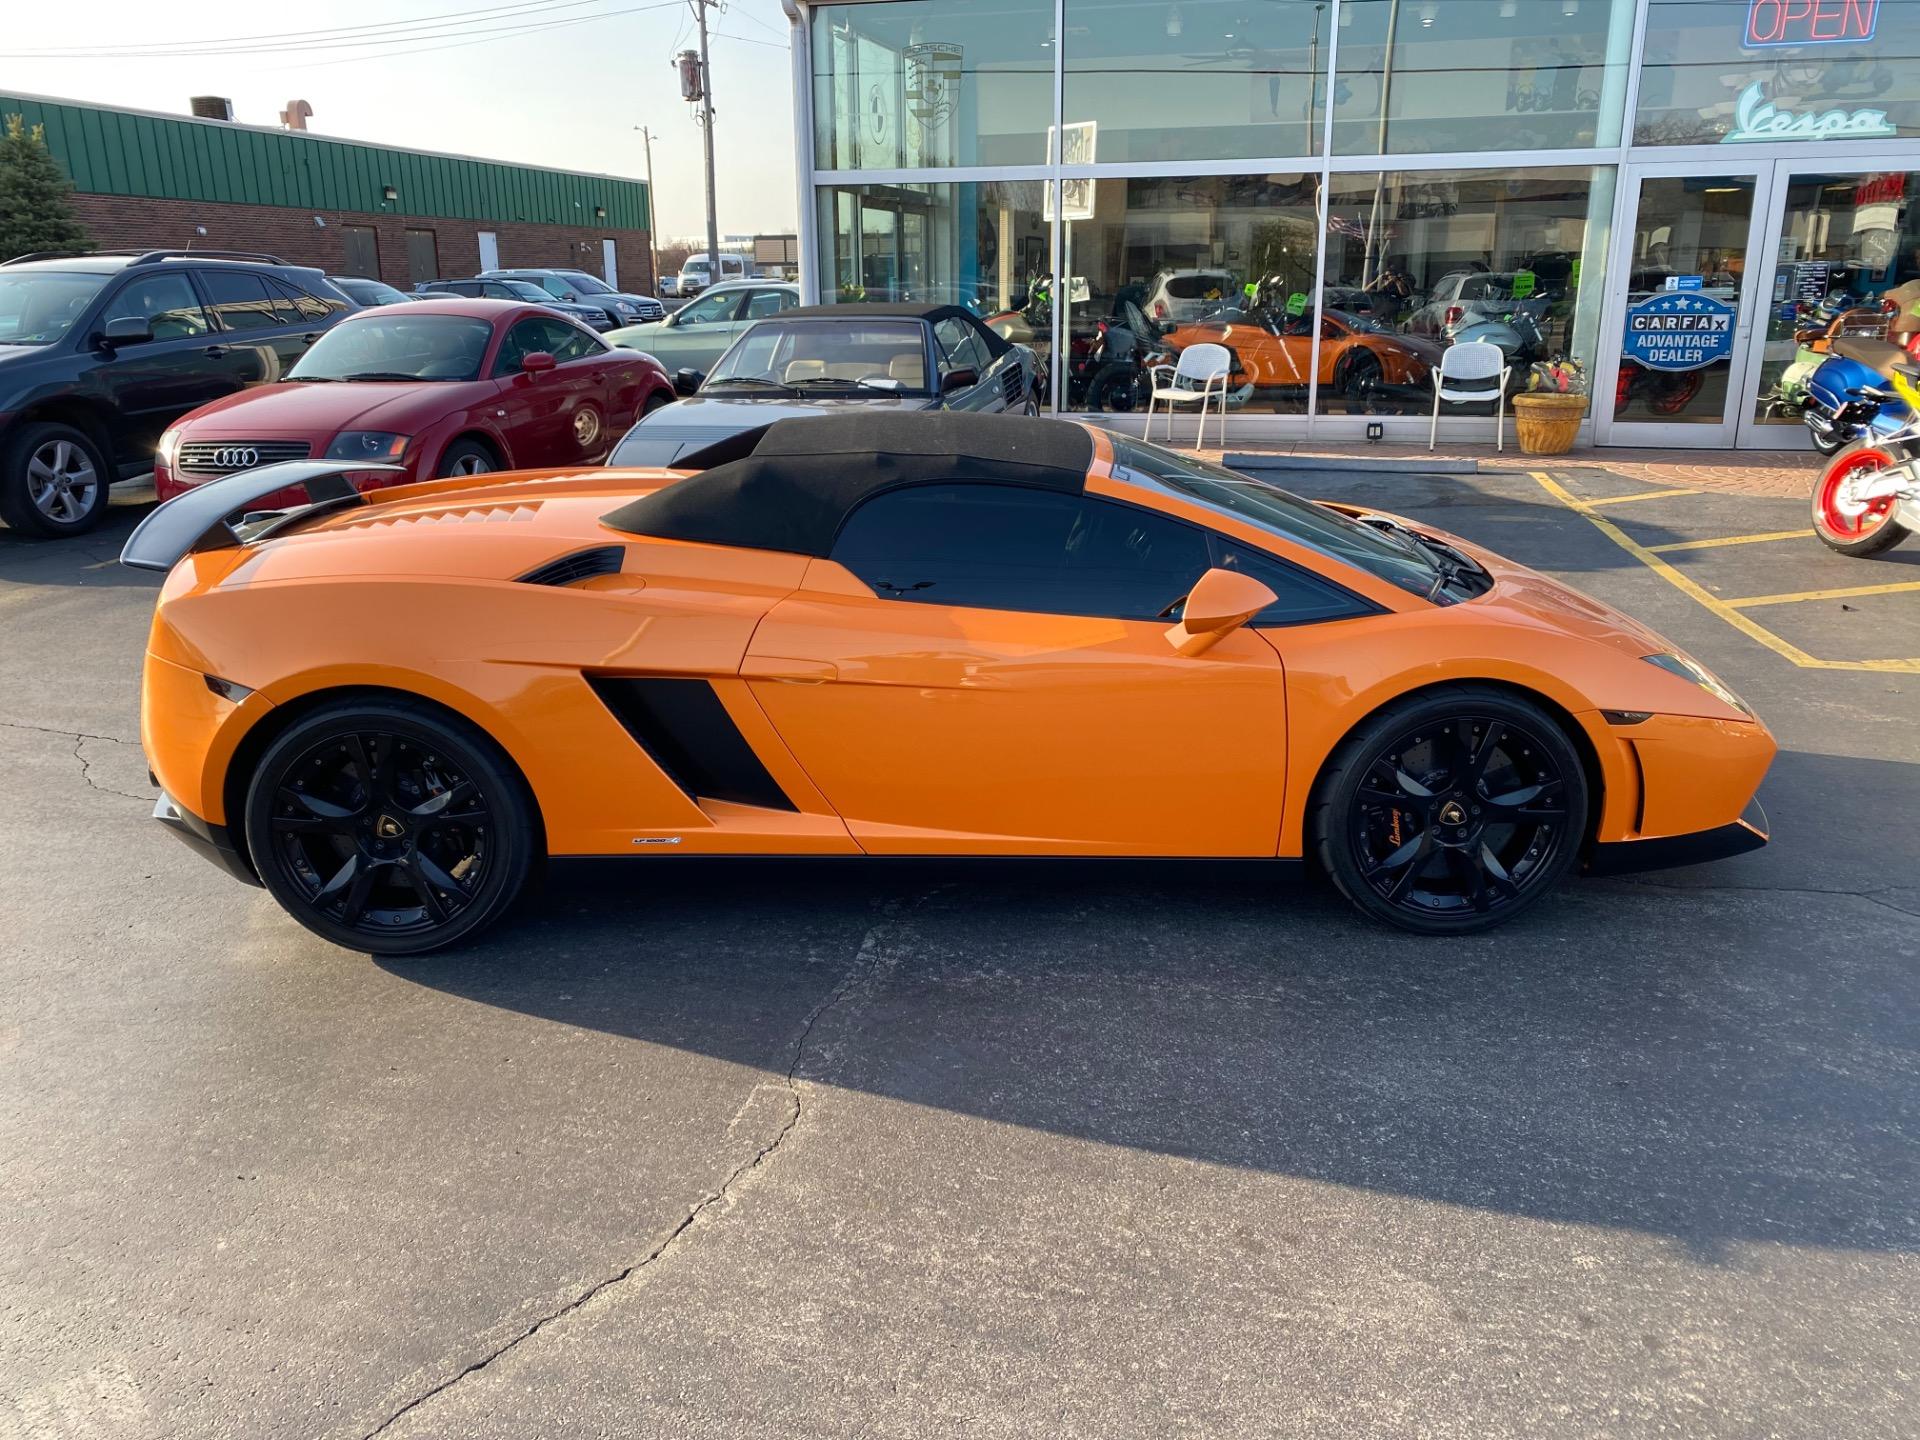 Used-2010-Lamborghini-Gallardo-LP-560-4-Spyder-/-Underground-Racing-Stage-3-Twin-Turbo-System-1250HP!!